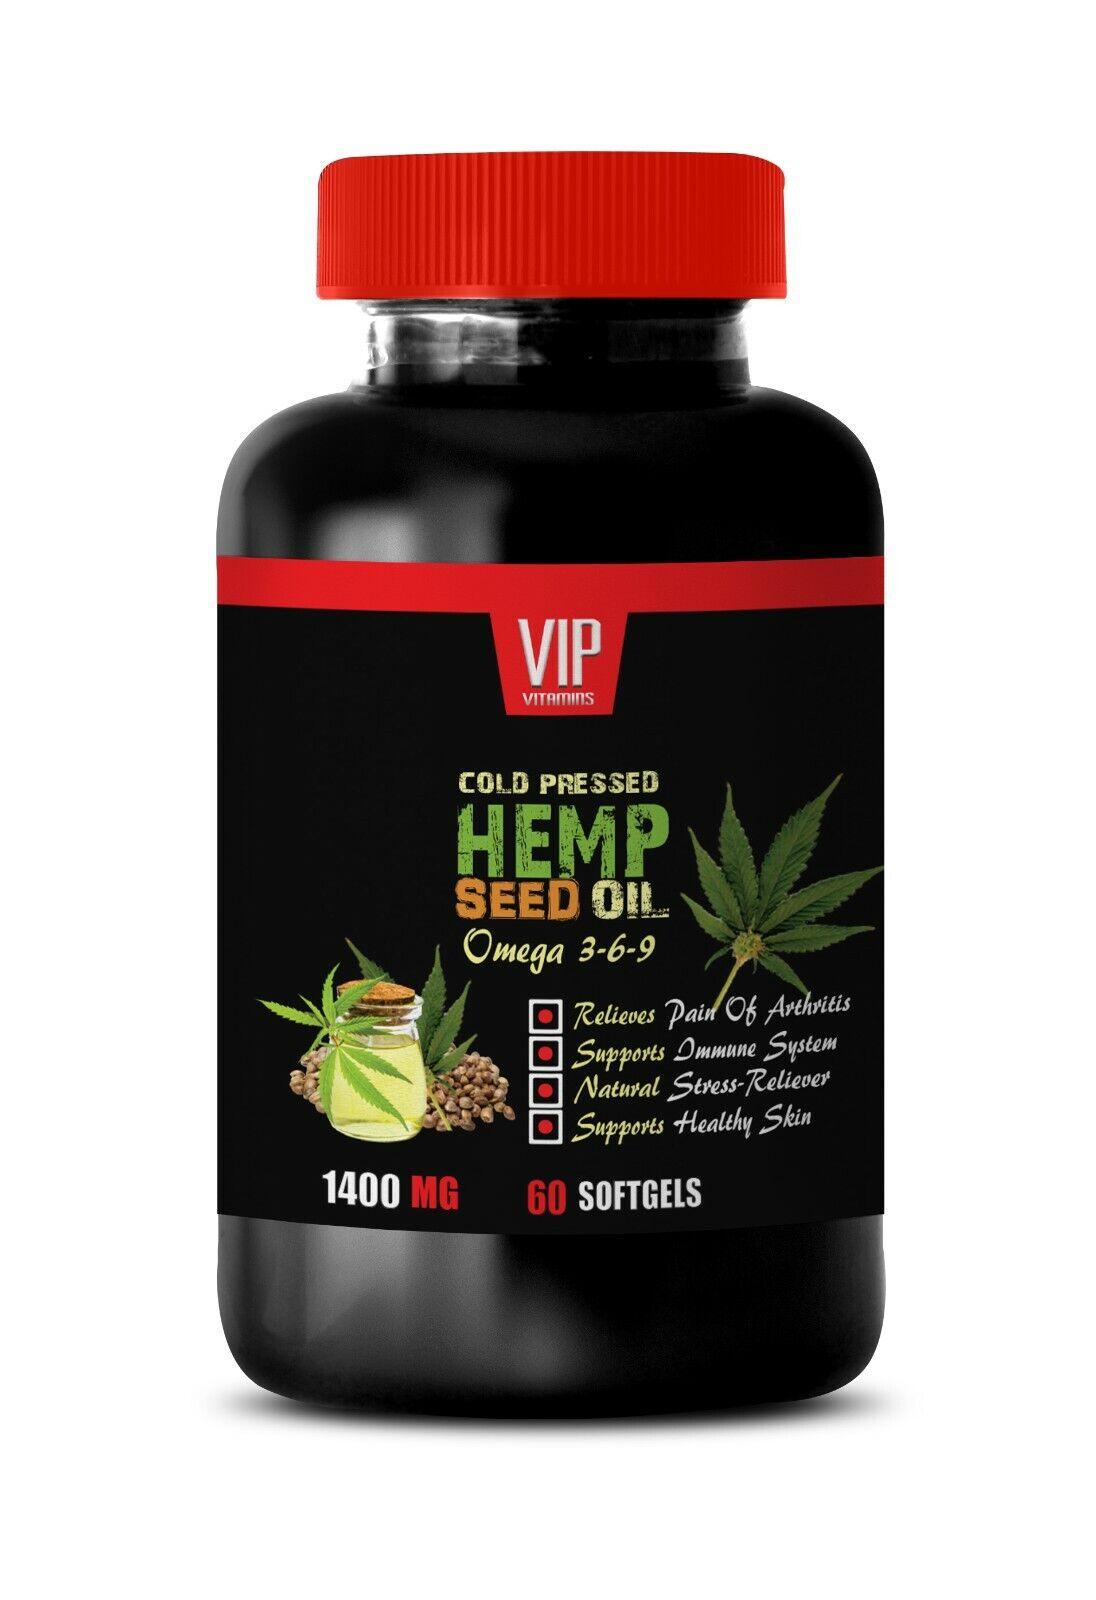 hemp capsules - Hemp Seed Oil 1400mg (1) - anti inflammatory capsules for joints